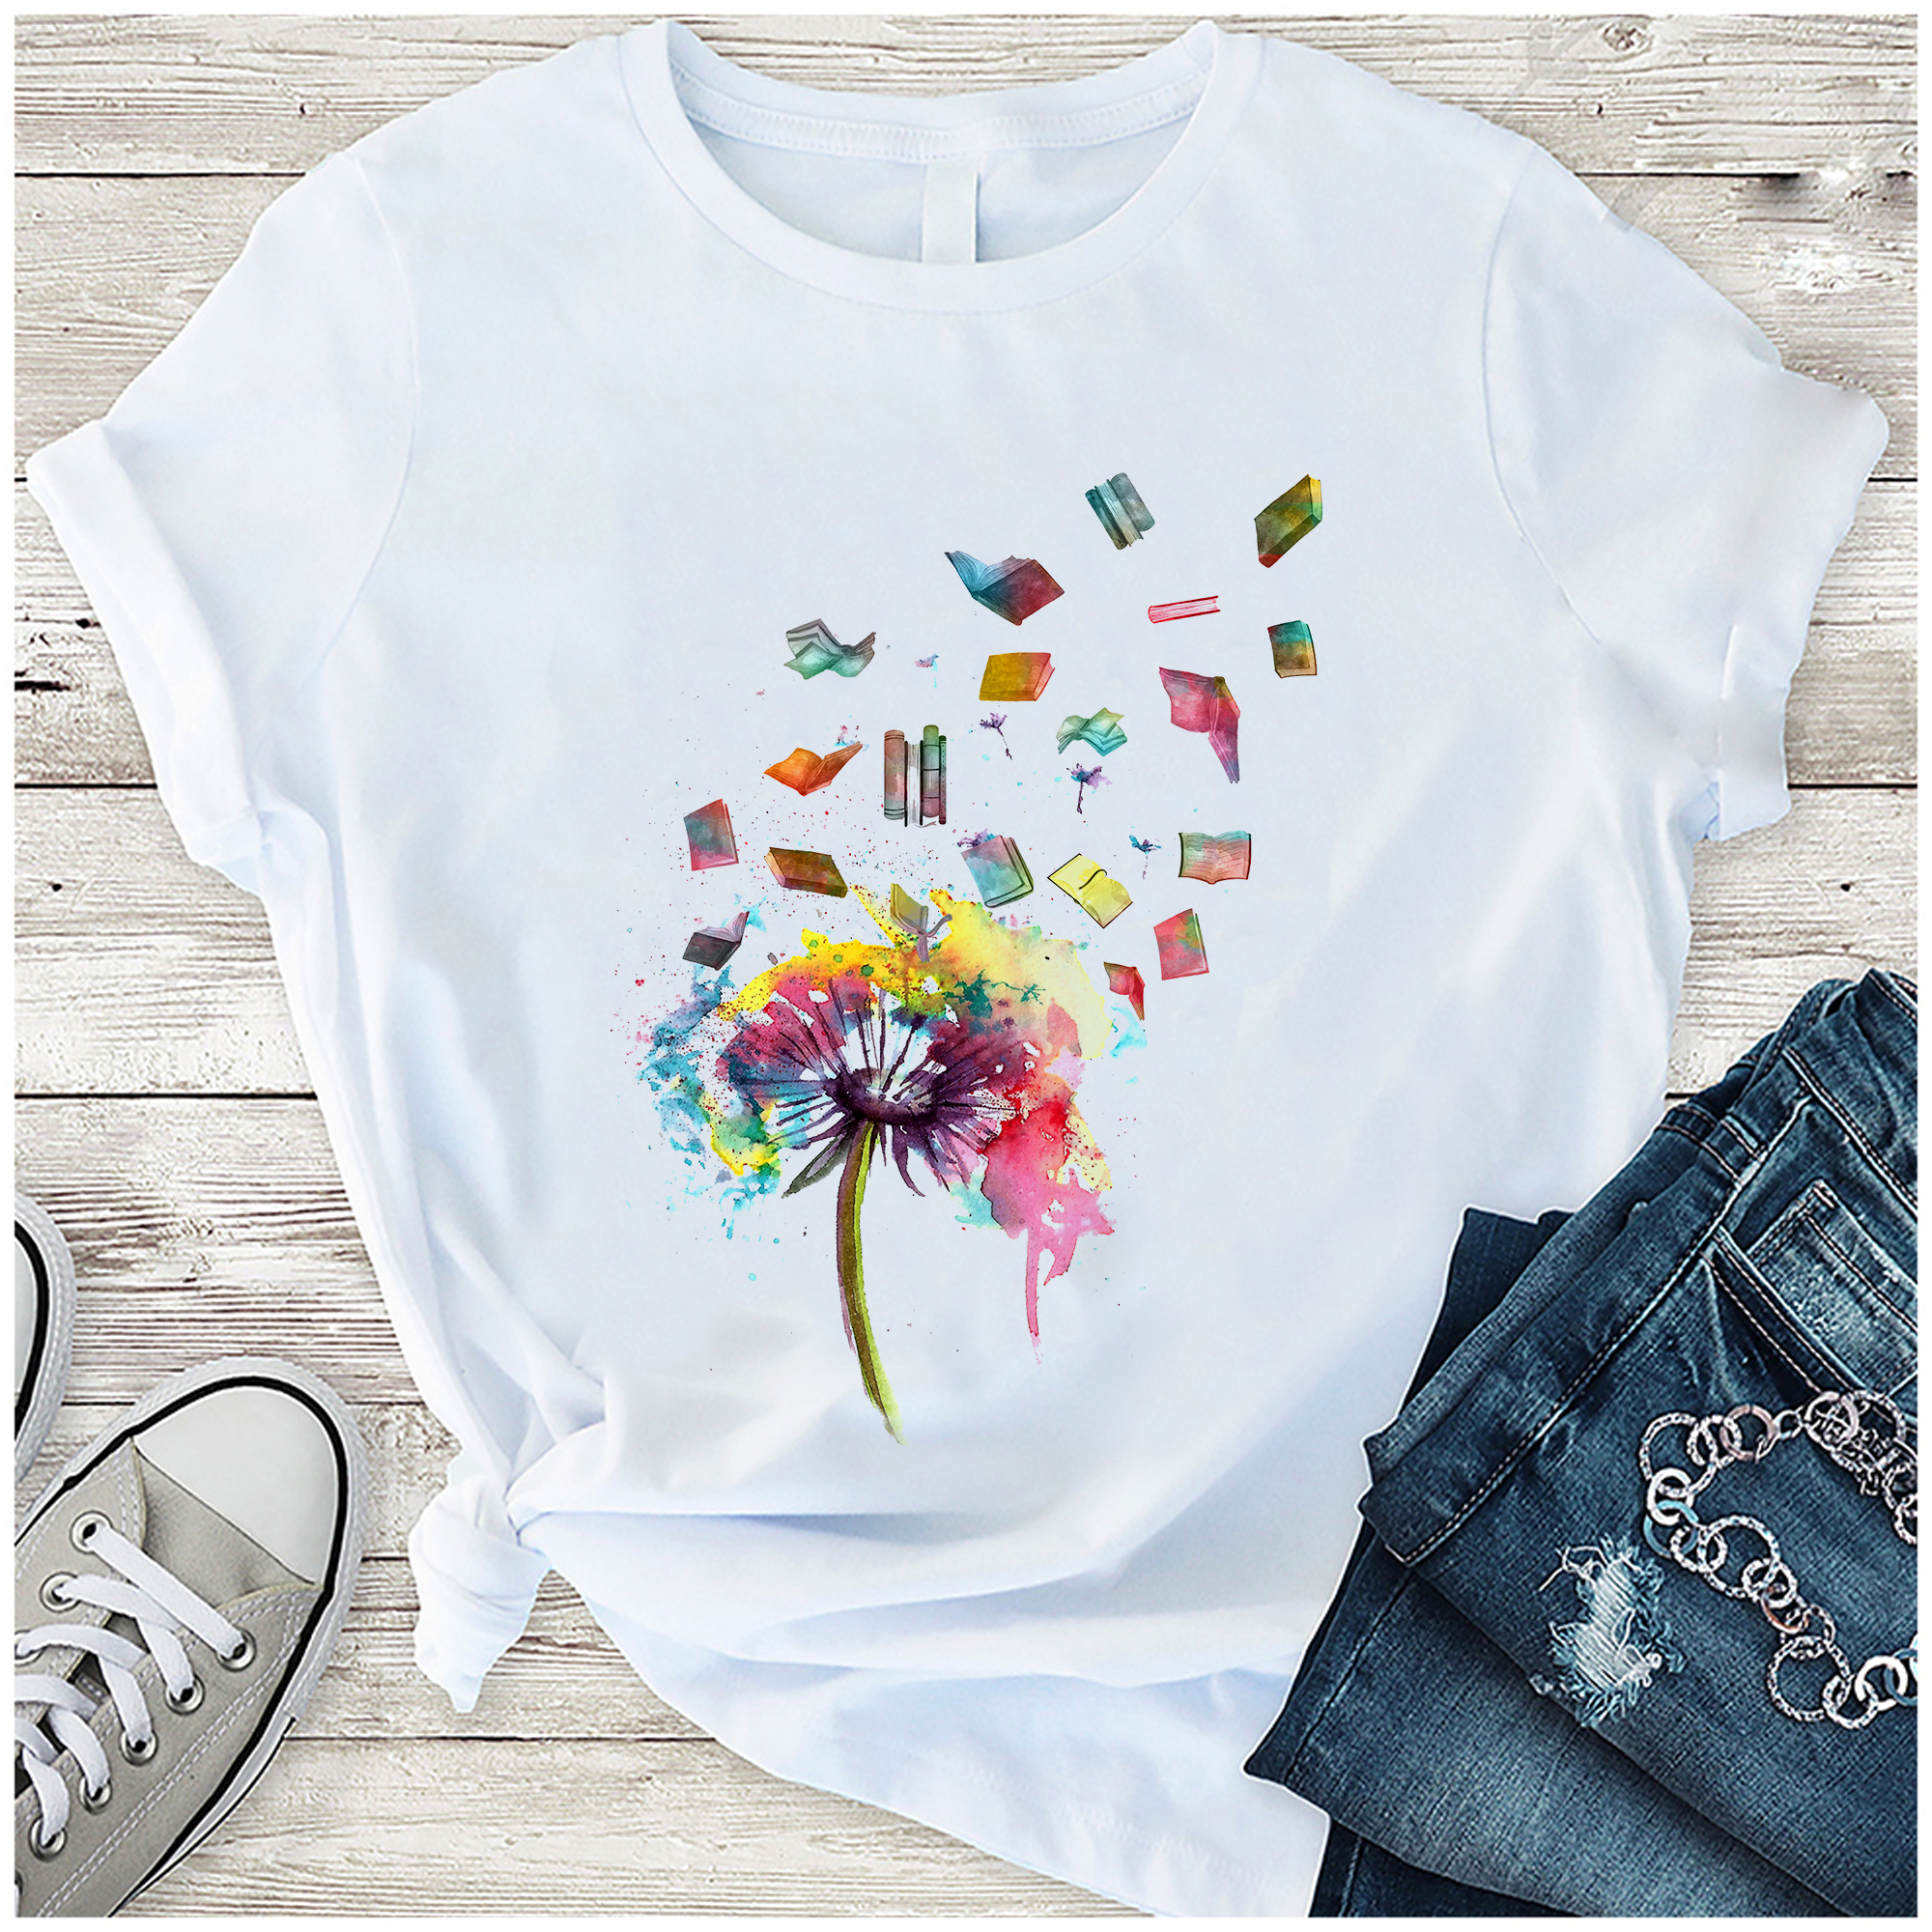 Book Shirt Watercolor Dandelion Books Fly